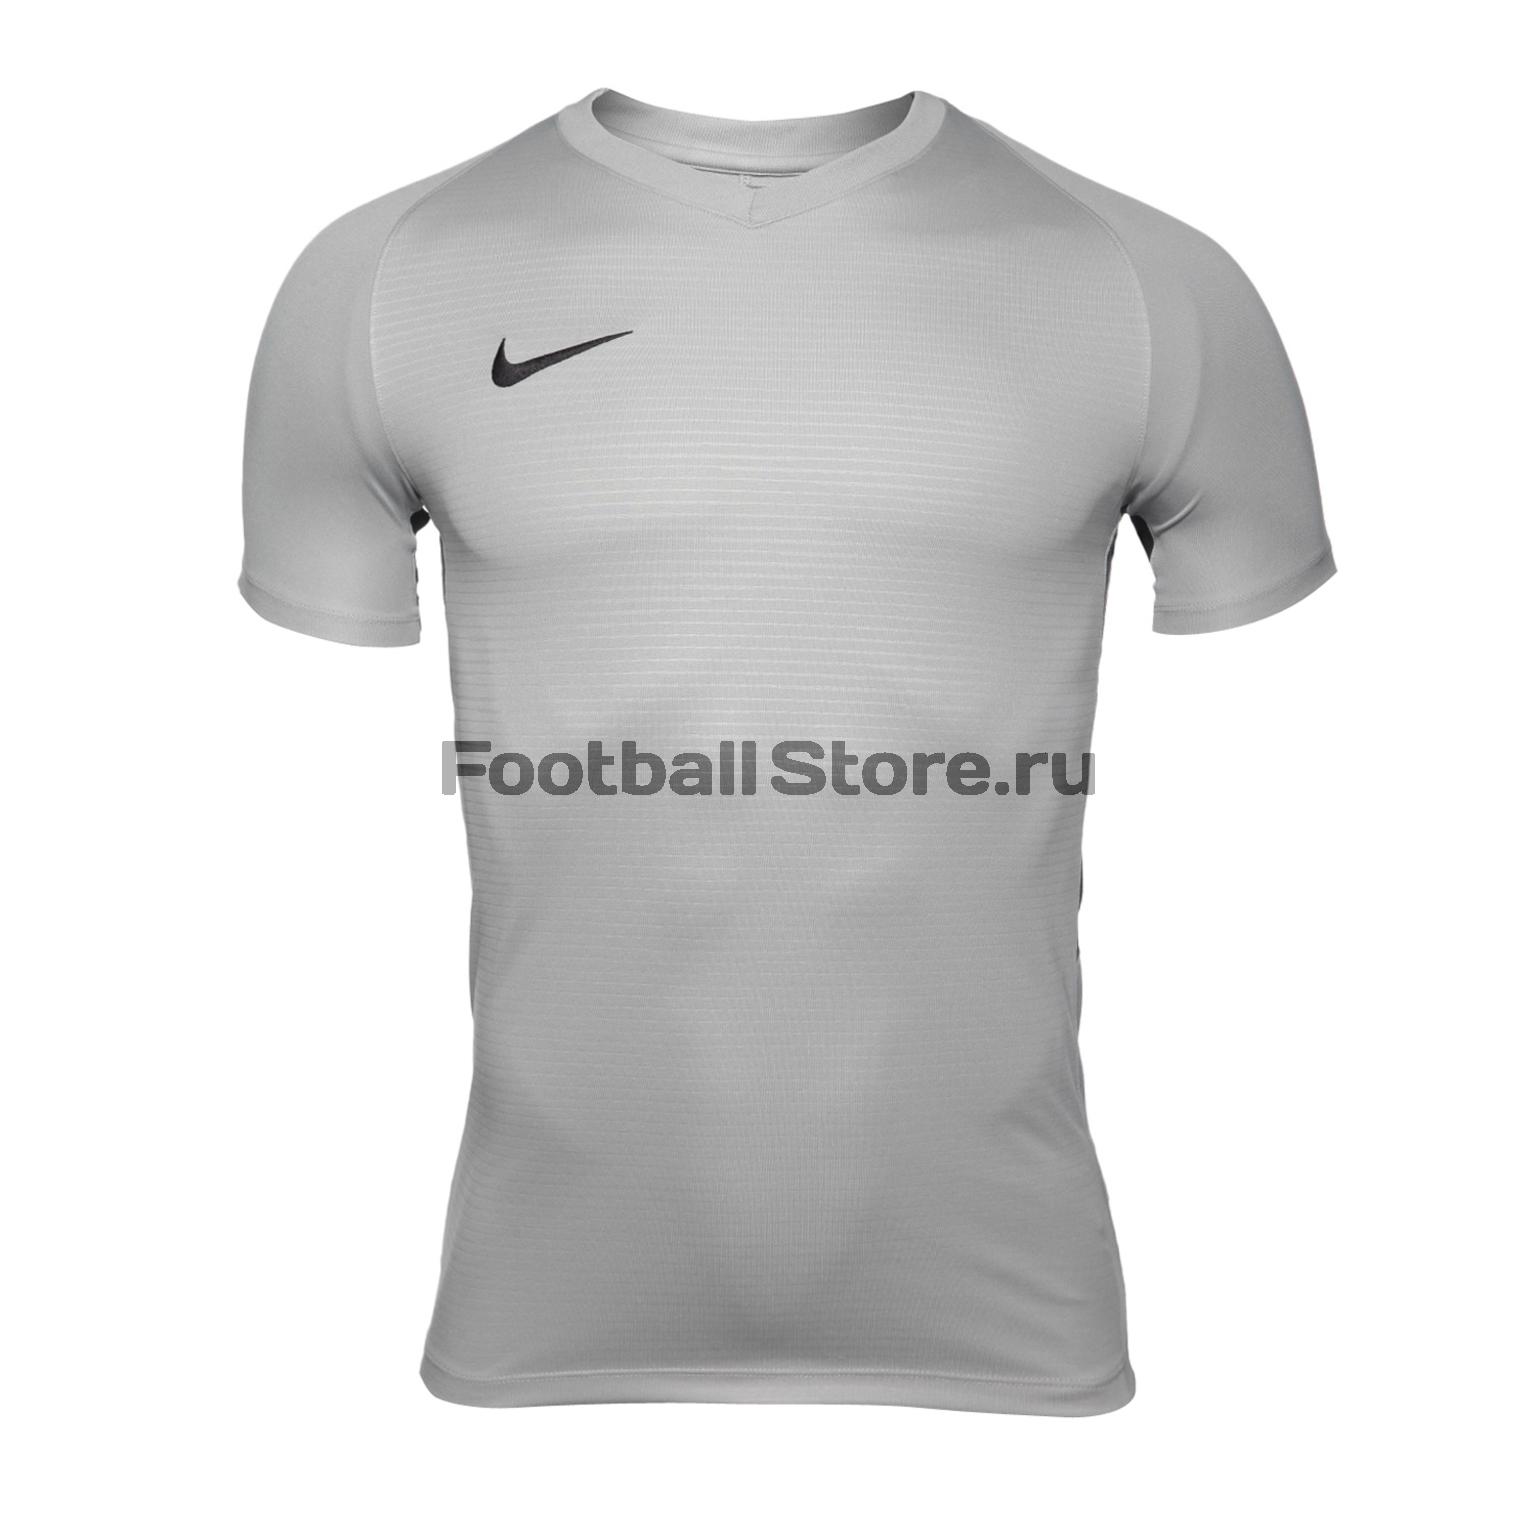 Футболка игровая Nike Dry Tiempo Prem JSY SS 894230-057 nike футболка игровая nike m nk dry acdmy top ss gx 832985 452